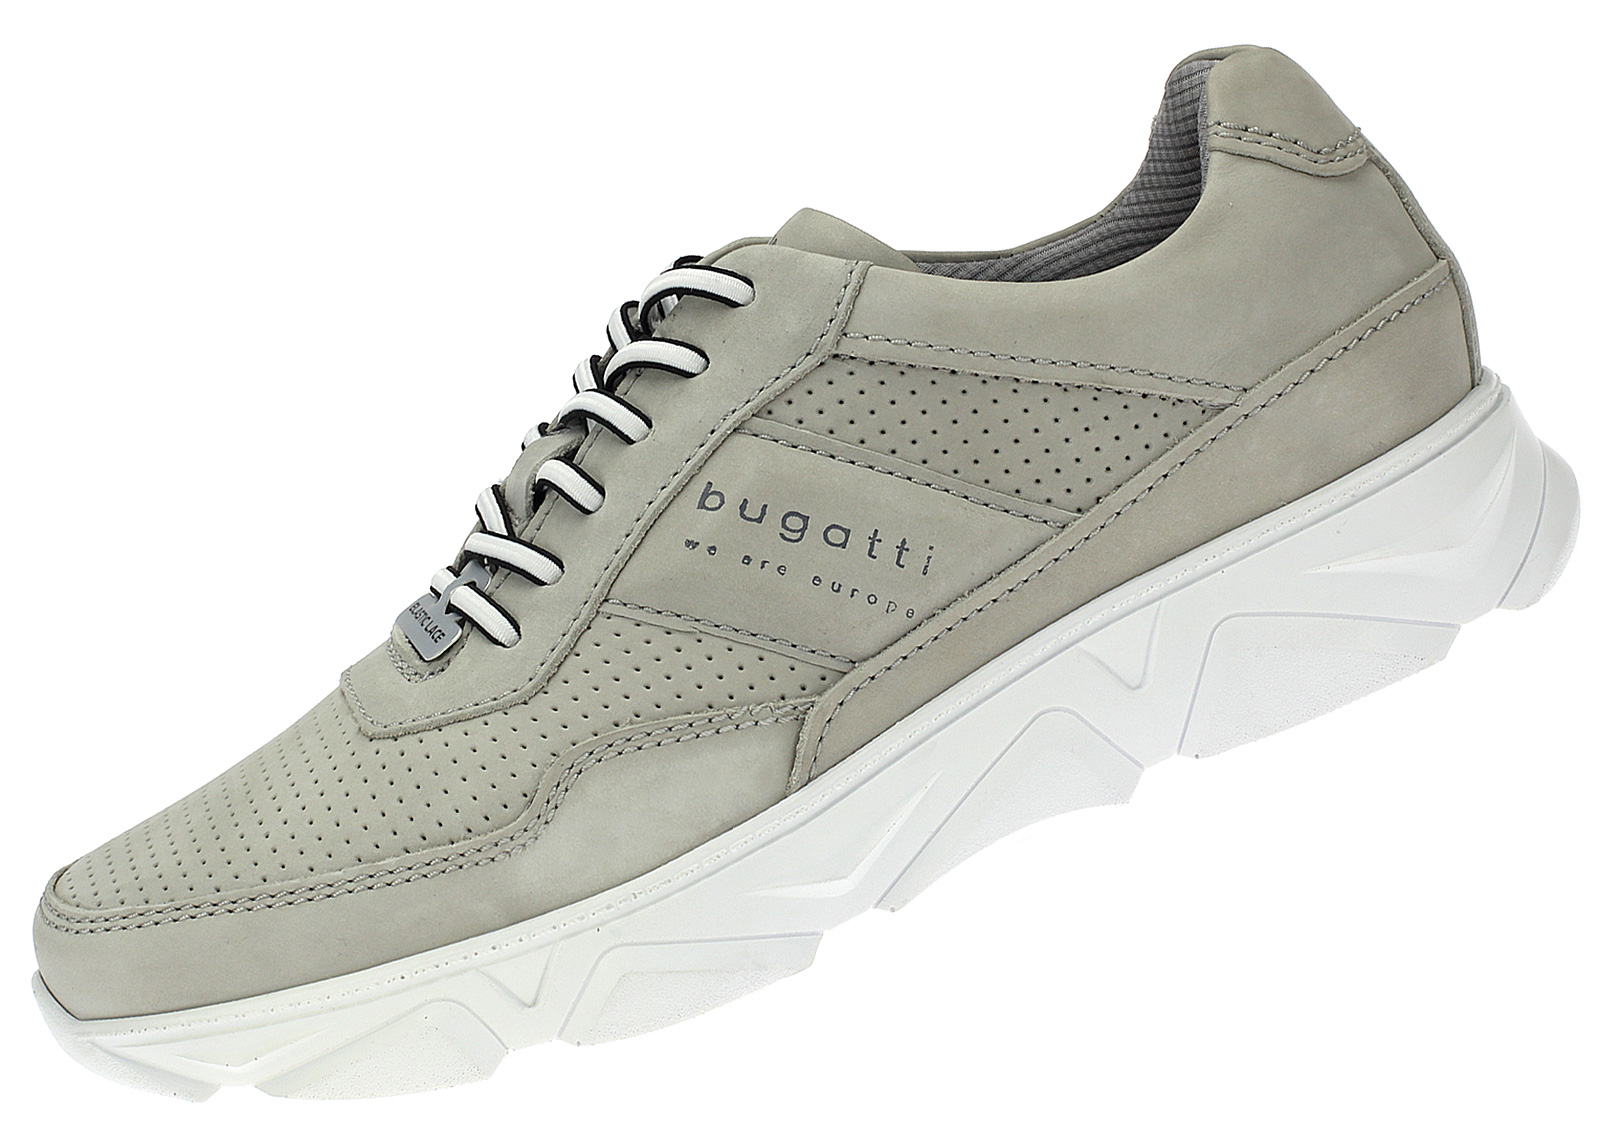 Bugatti Herrenschuhe Sneake Schnürschuhe